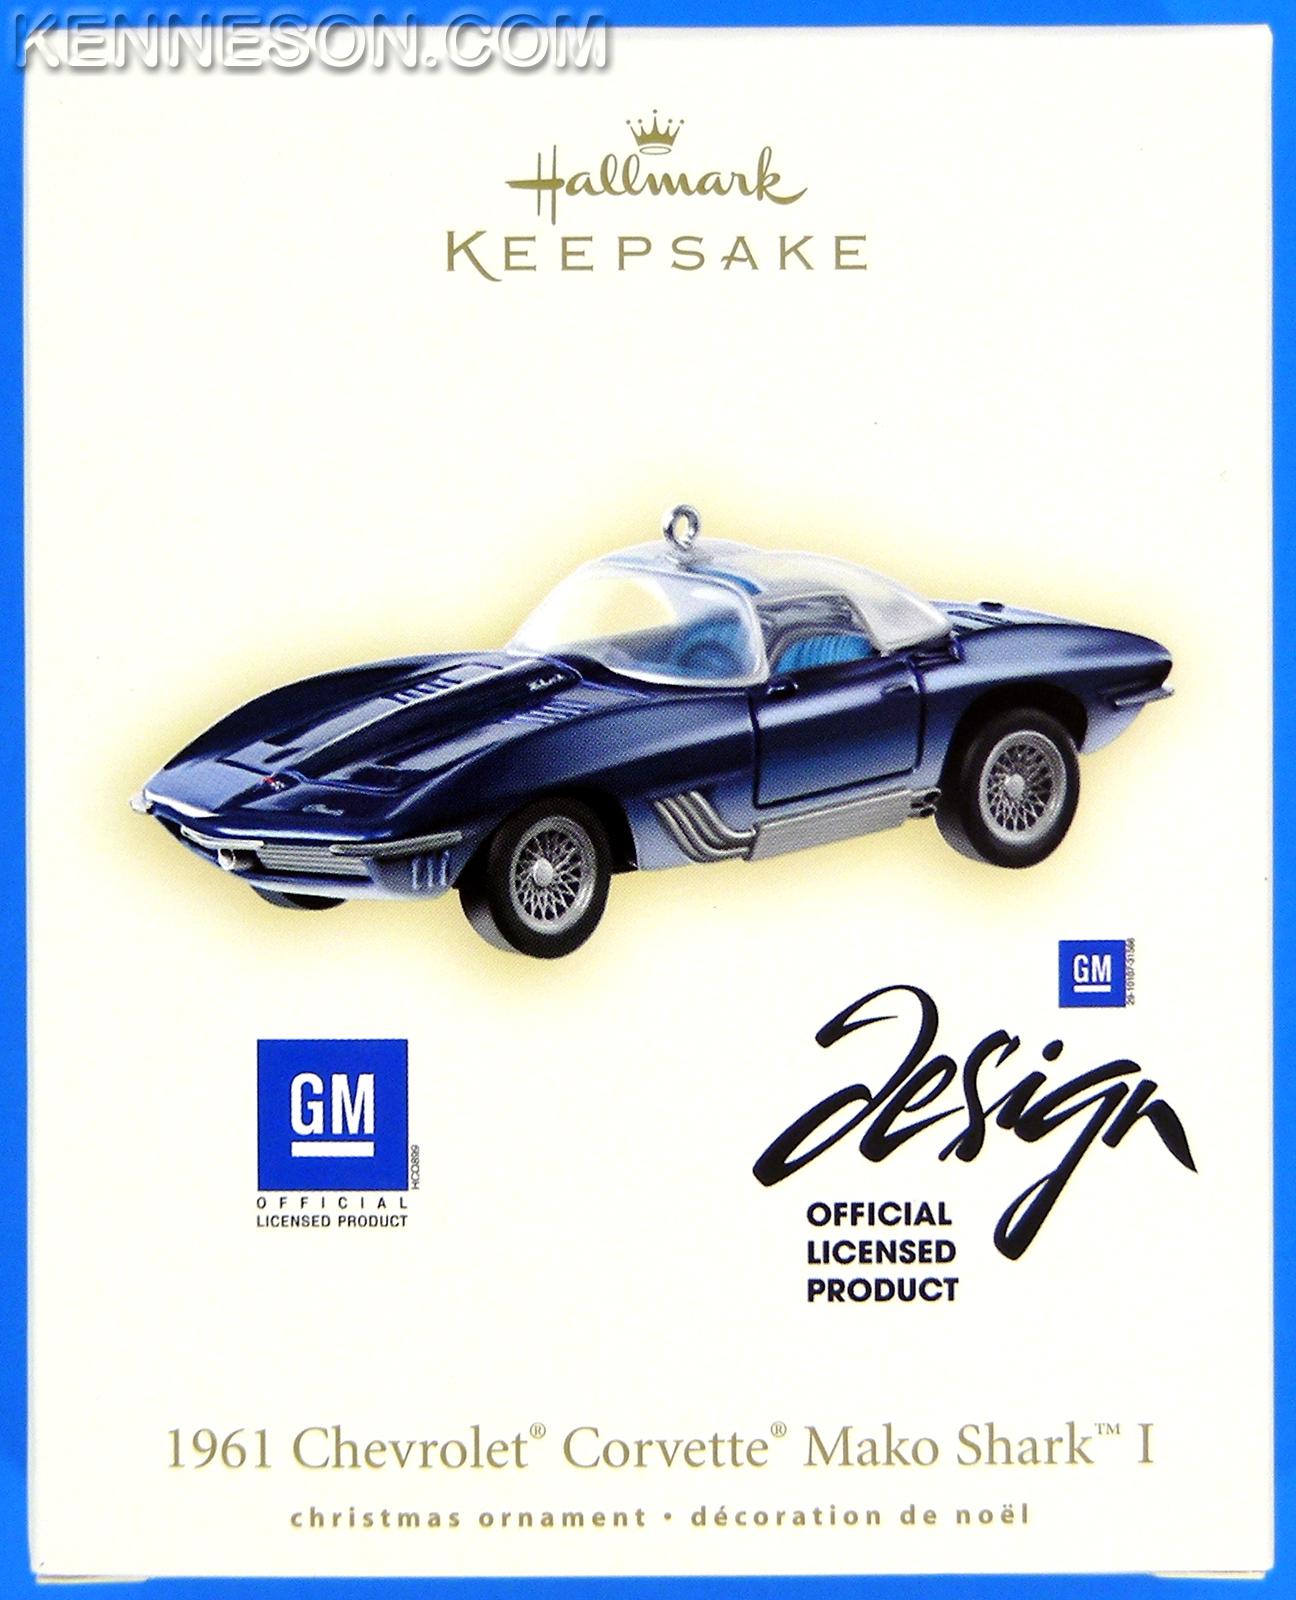 1961 chevrolet corvette mako shark i gm die cast metal hallmark rh ebay com Levon Helm Levon Helm